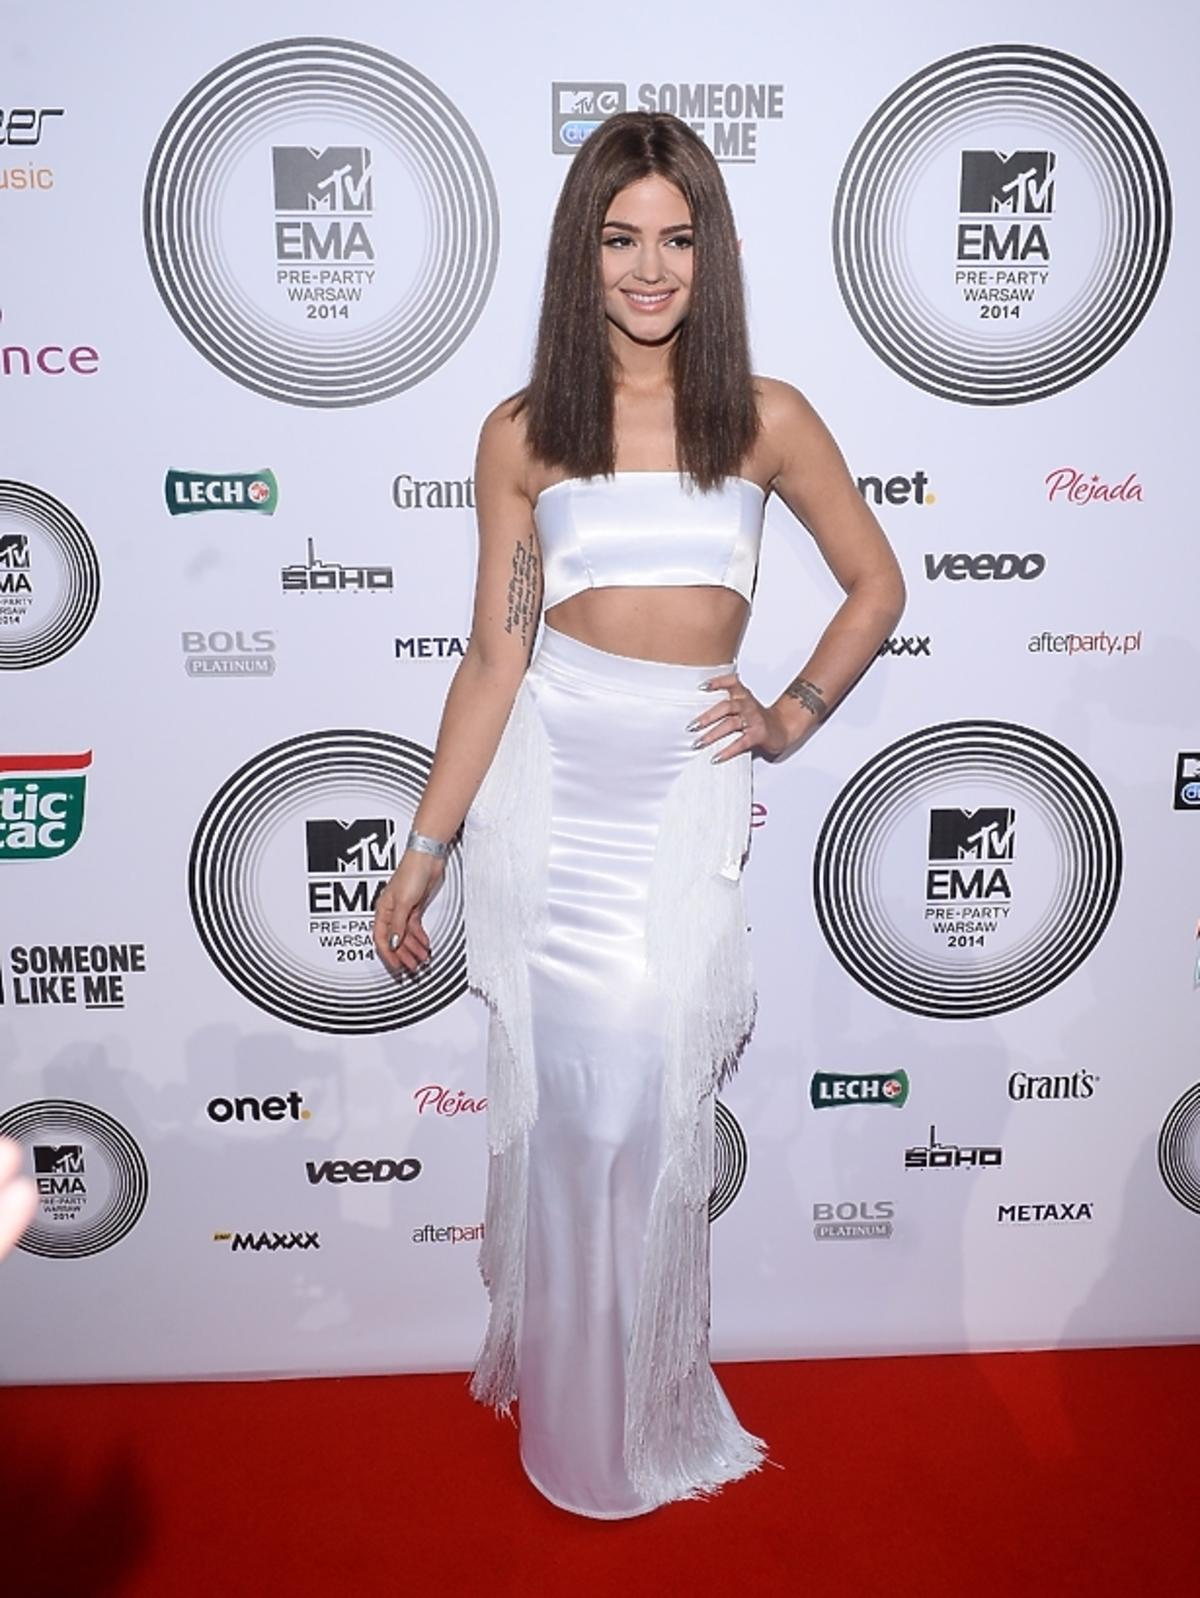 Honorata Skarbek w nowej fryzurze na MTV EMA 2014 Pre-Party